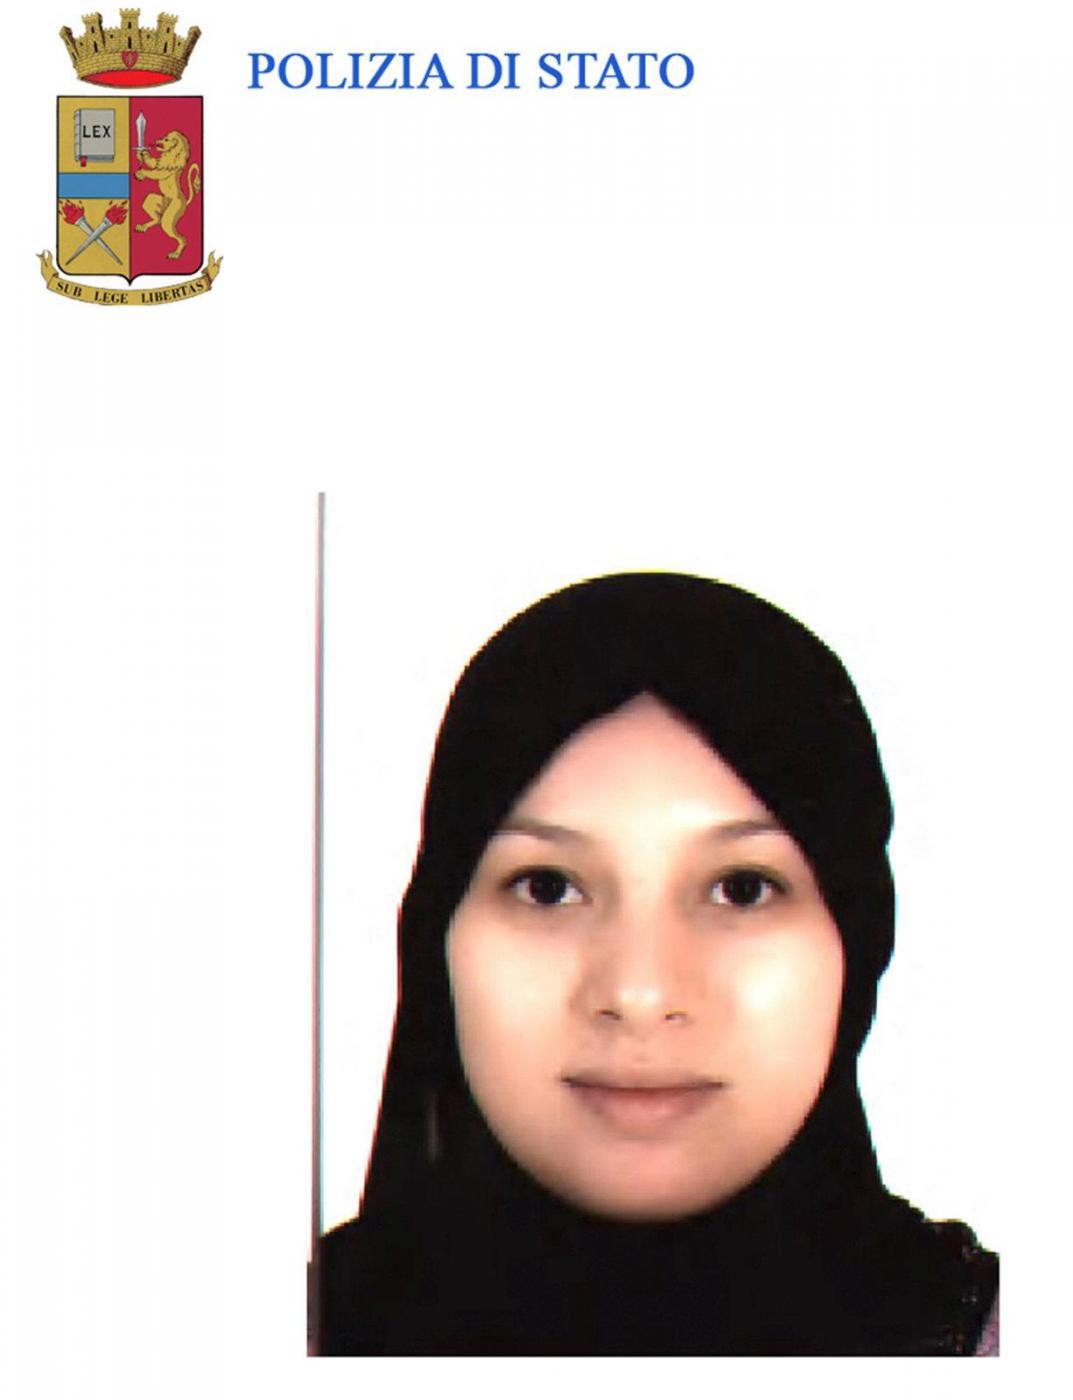 Terrorismo, arrestato nel lecchese Moutaharrik Abderrahim